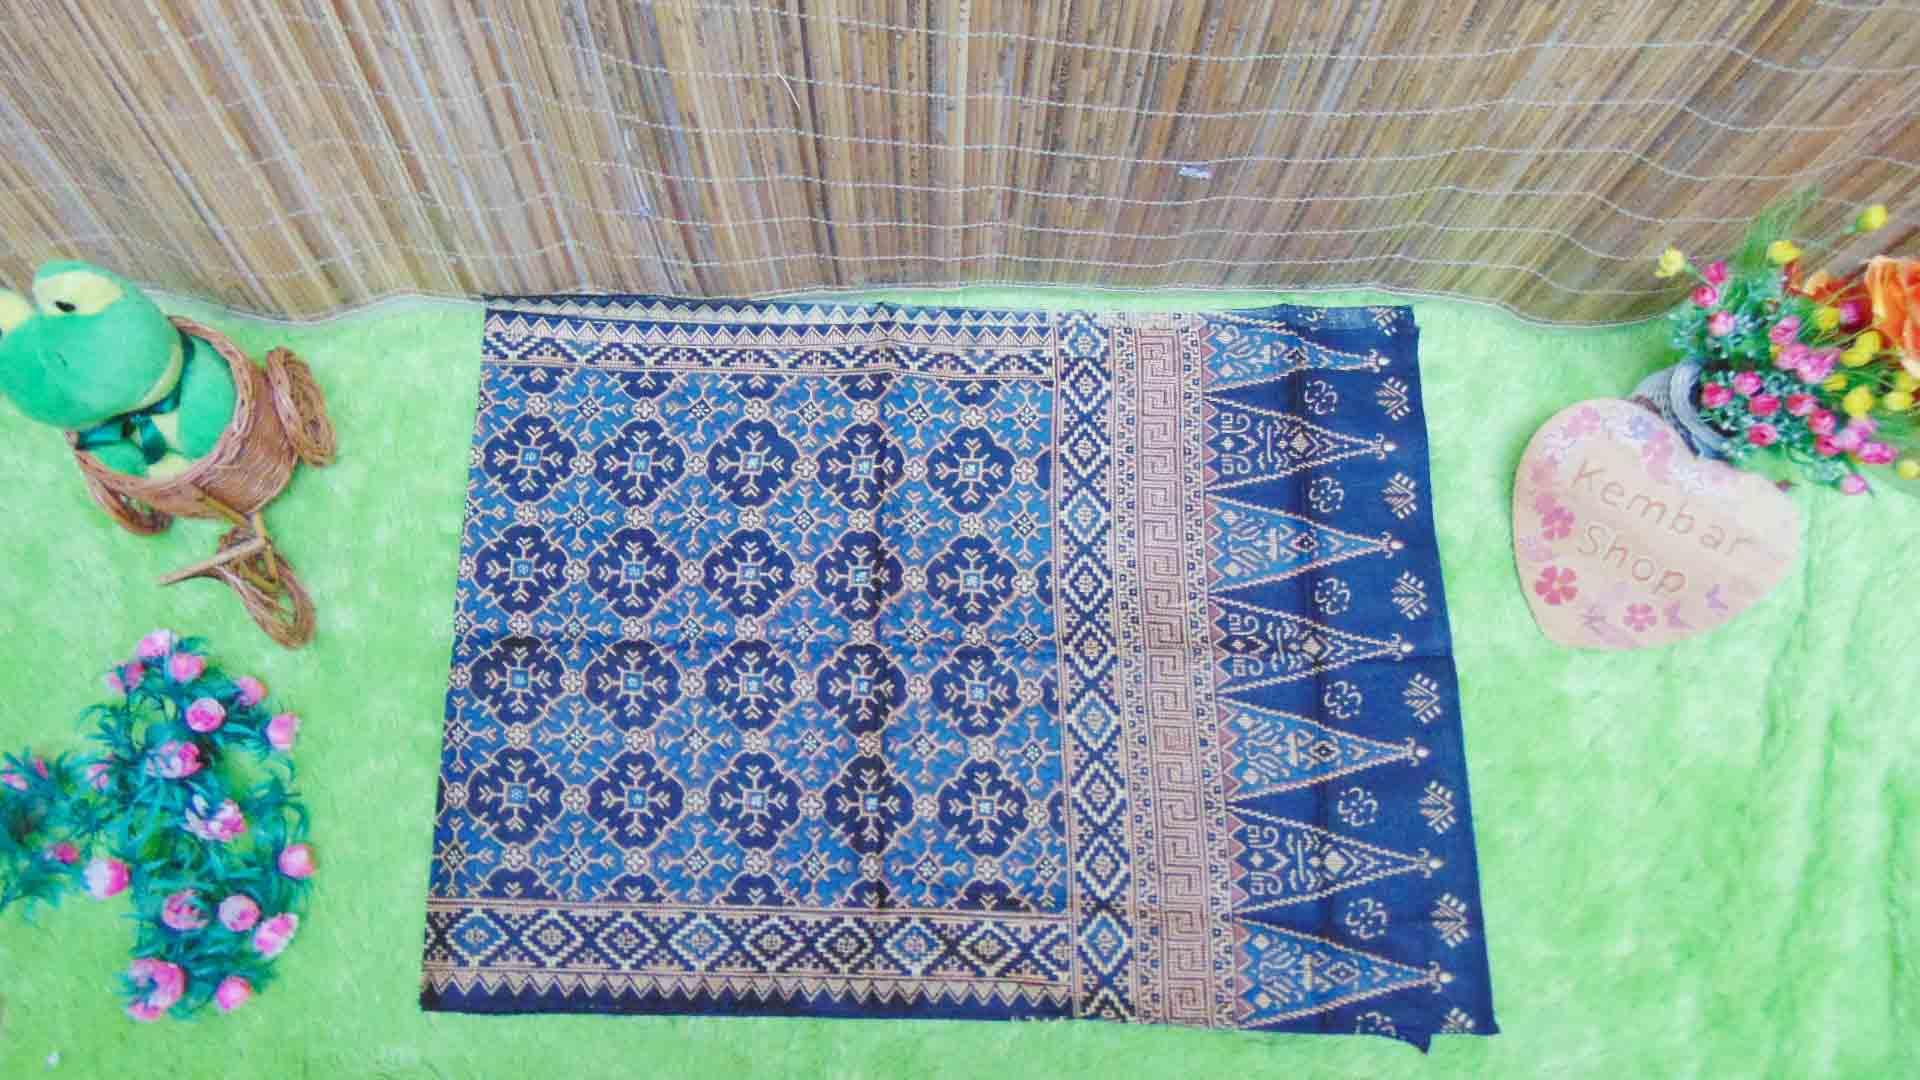 swaddle baby bedong kain batik bayi memanjang aneka motif tradisional random (1)